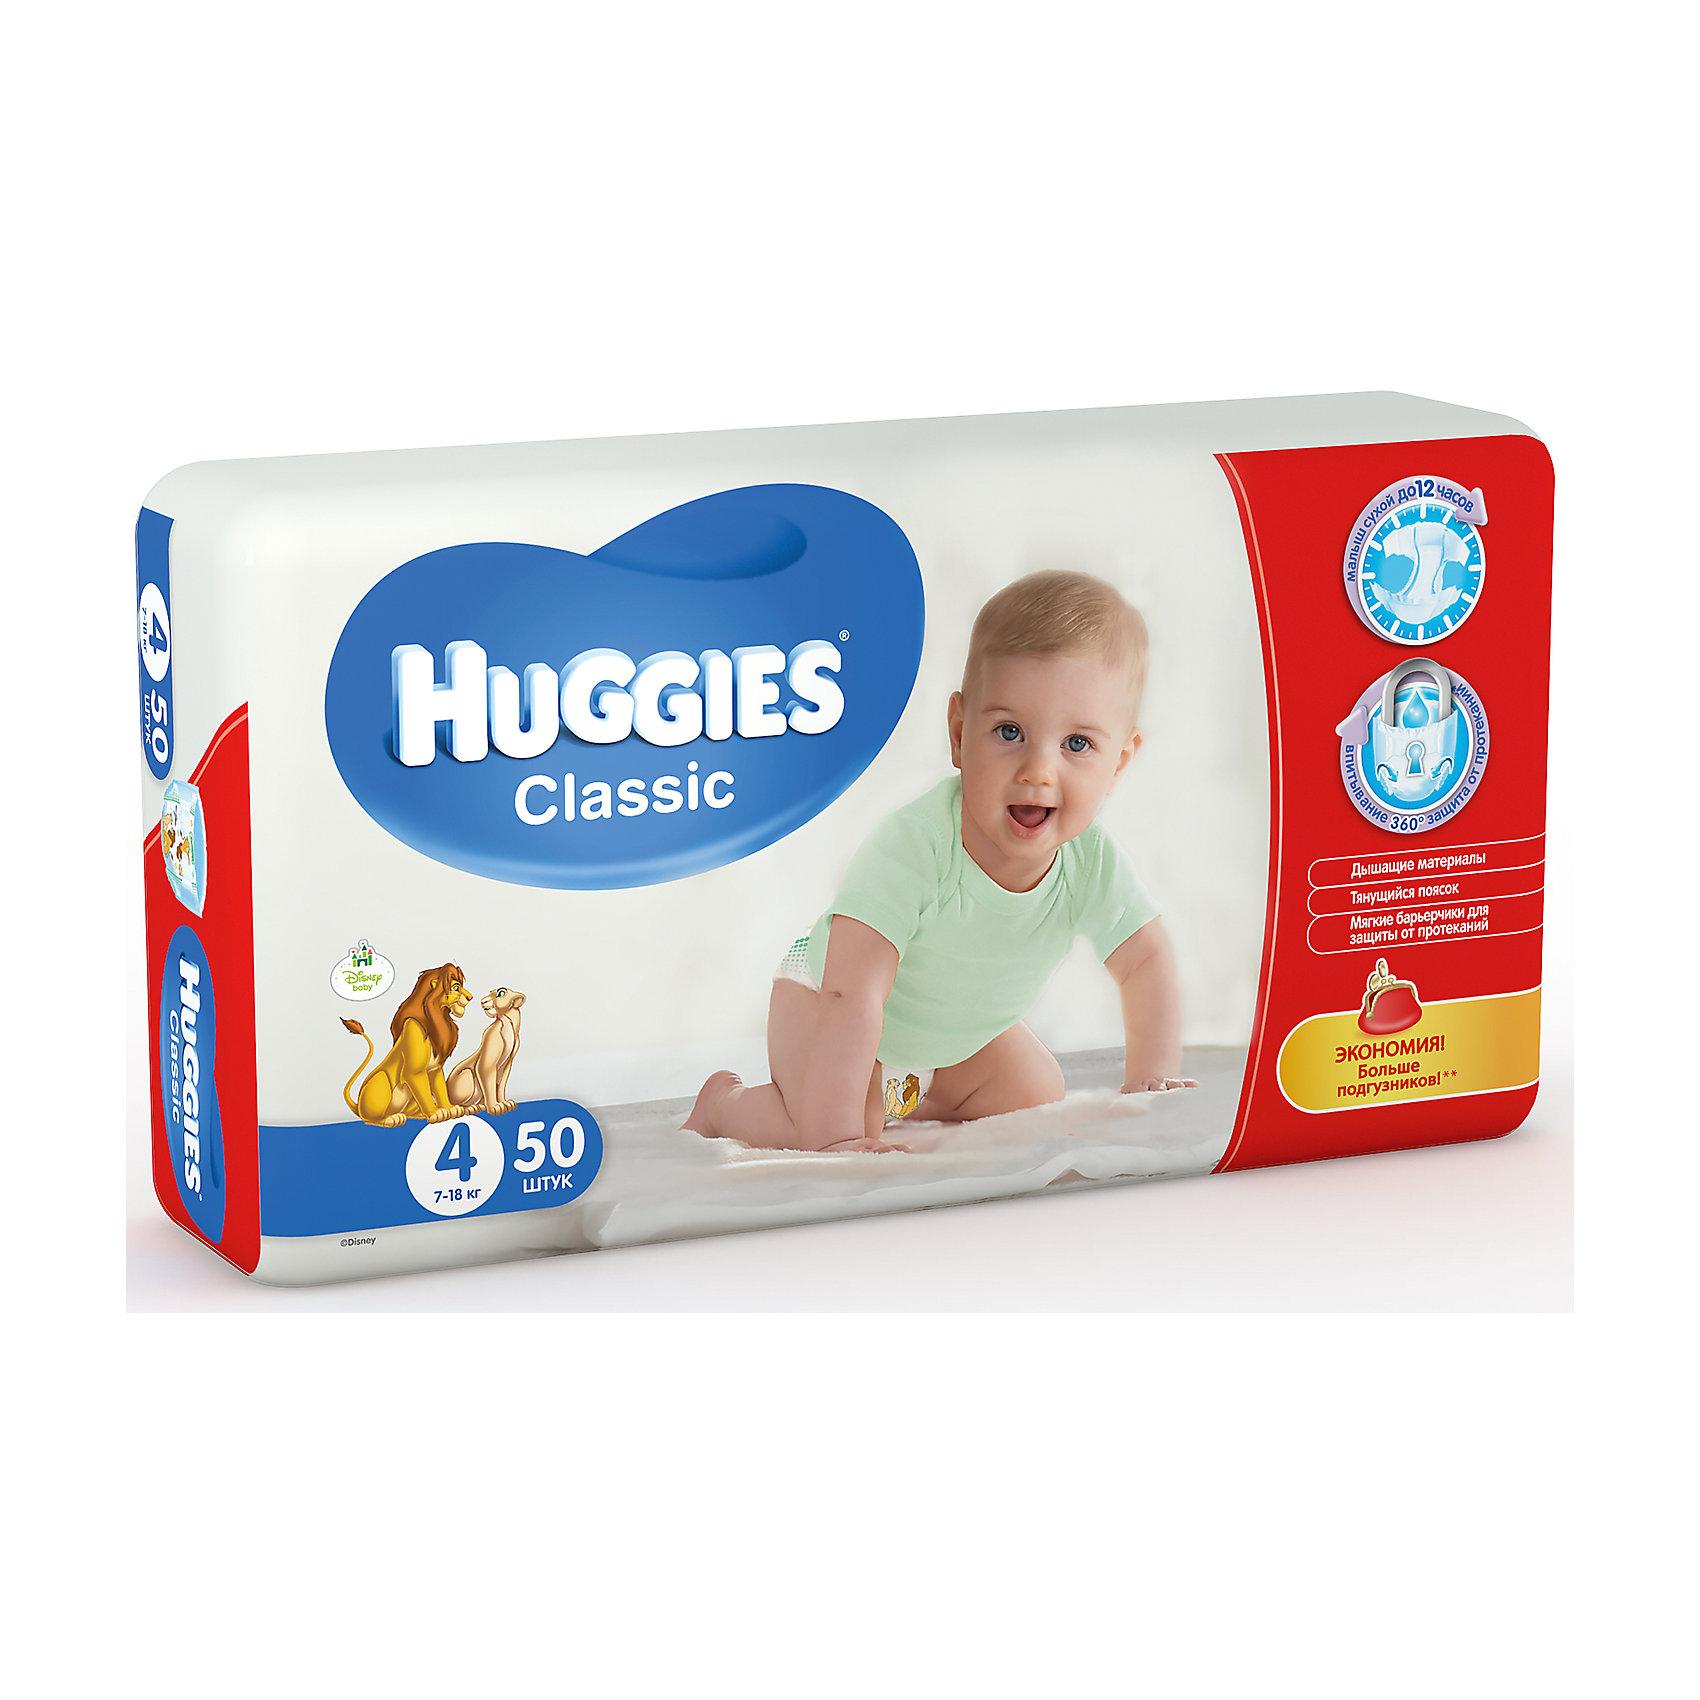 Подгузники Classic 4, джамбо 7-18 кг, 50шт., Huggies (HUGGIES)